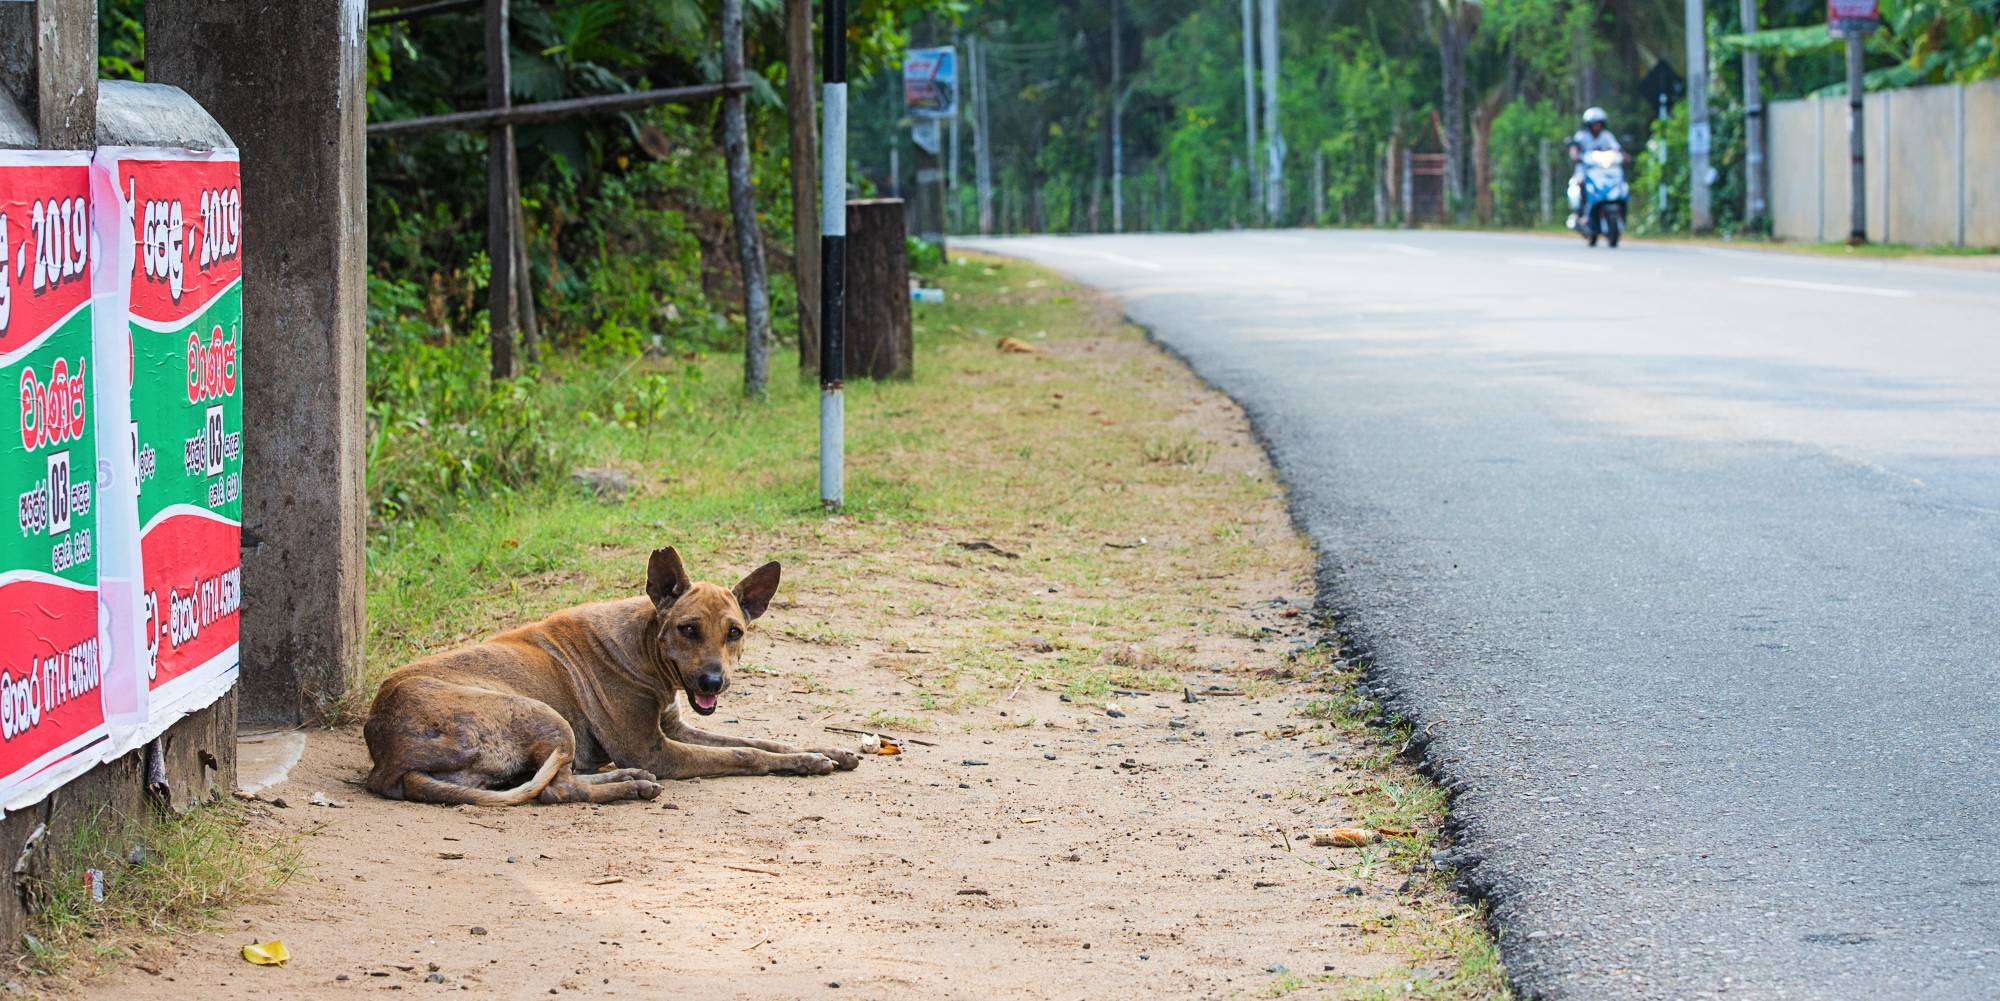 Street dog sitting by the road in Sri Lanka